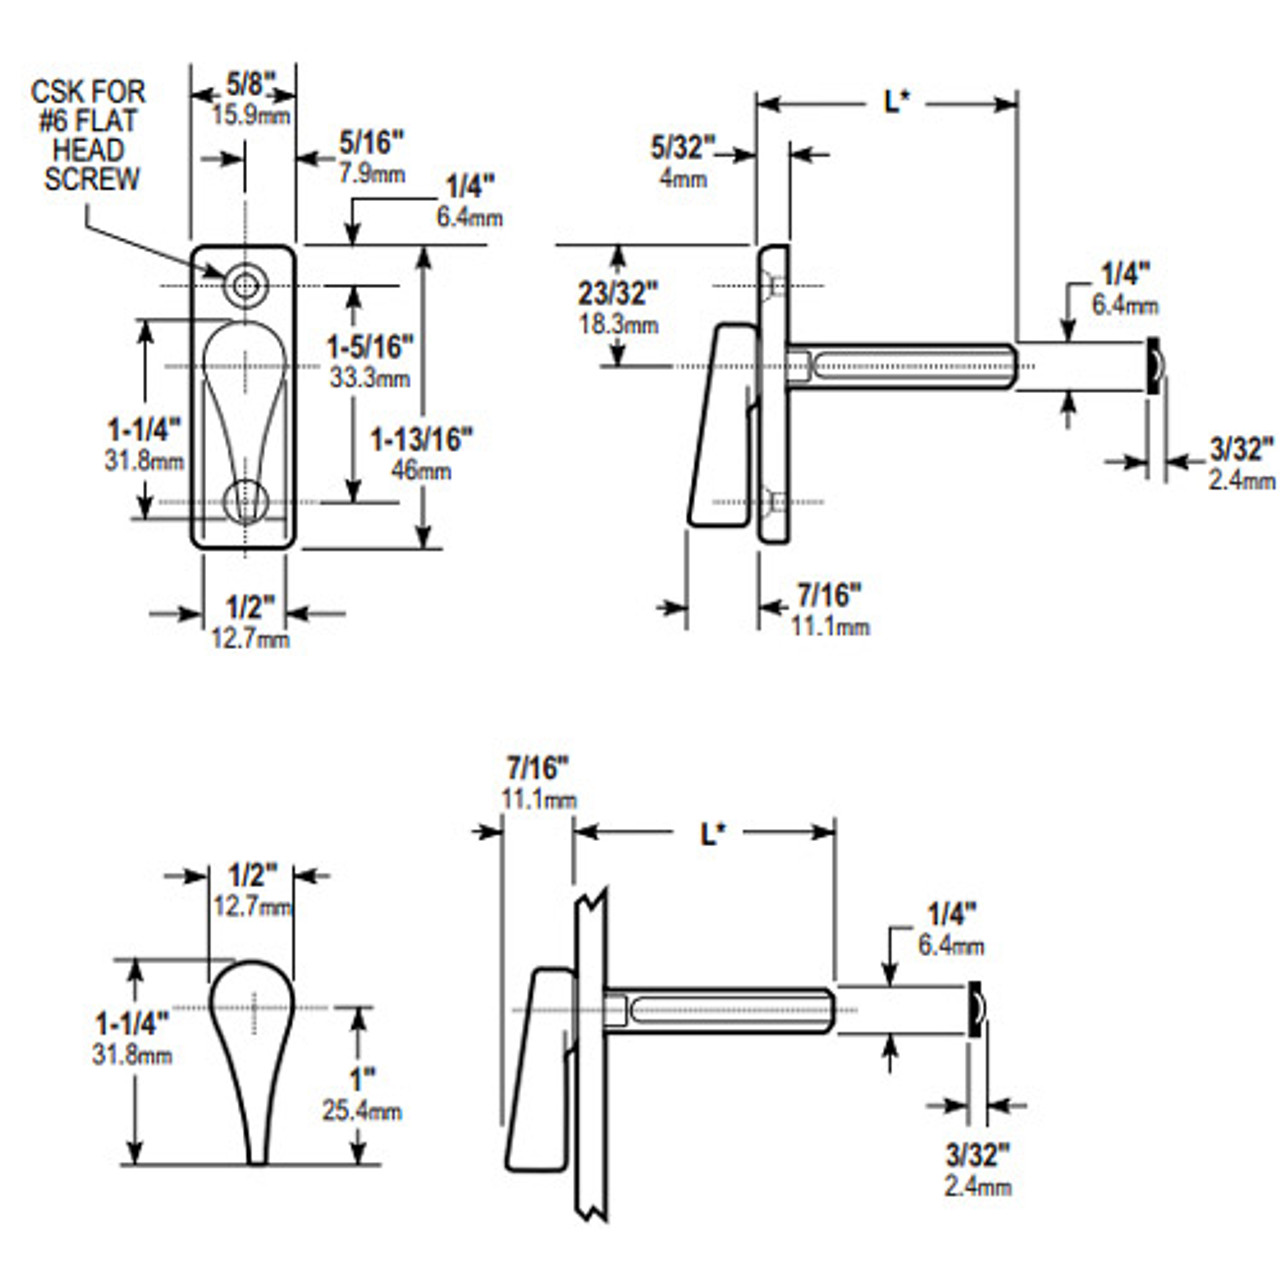 1000-21-16-121 Adams Rite 1000 Series Turns Dimensional View